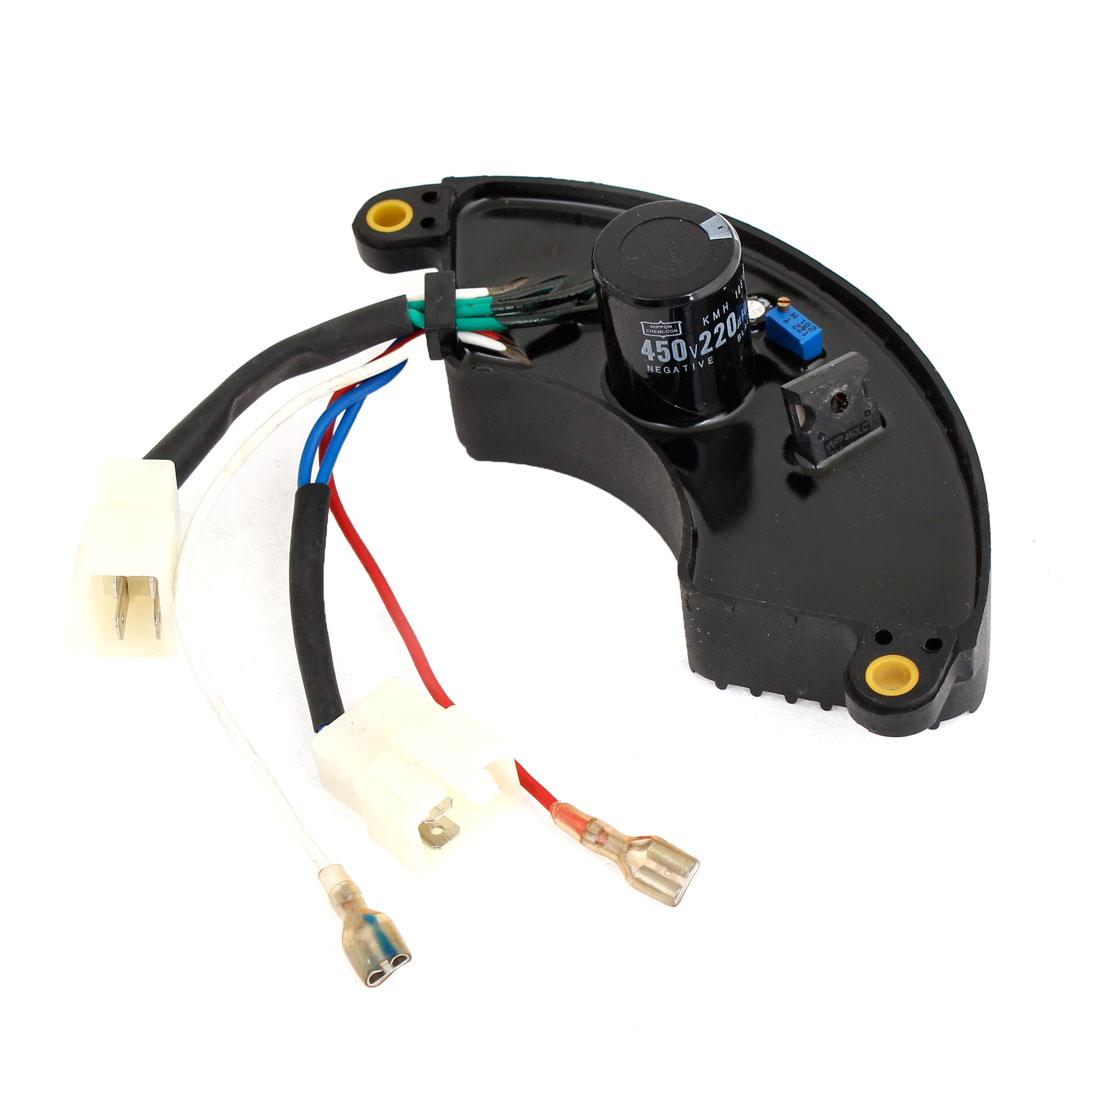 Motorcycle Parts Generator 5KW 220uF 450V Voltage Regulator Capacitor